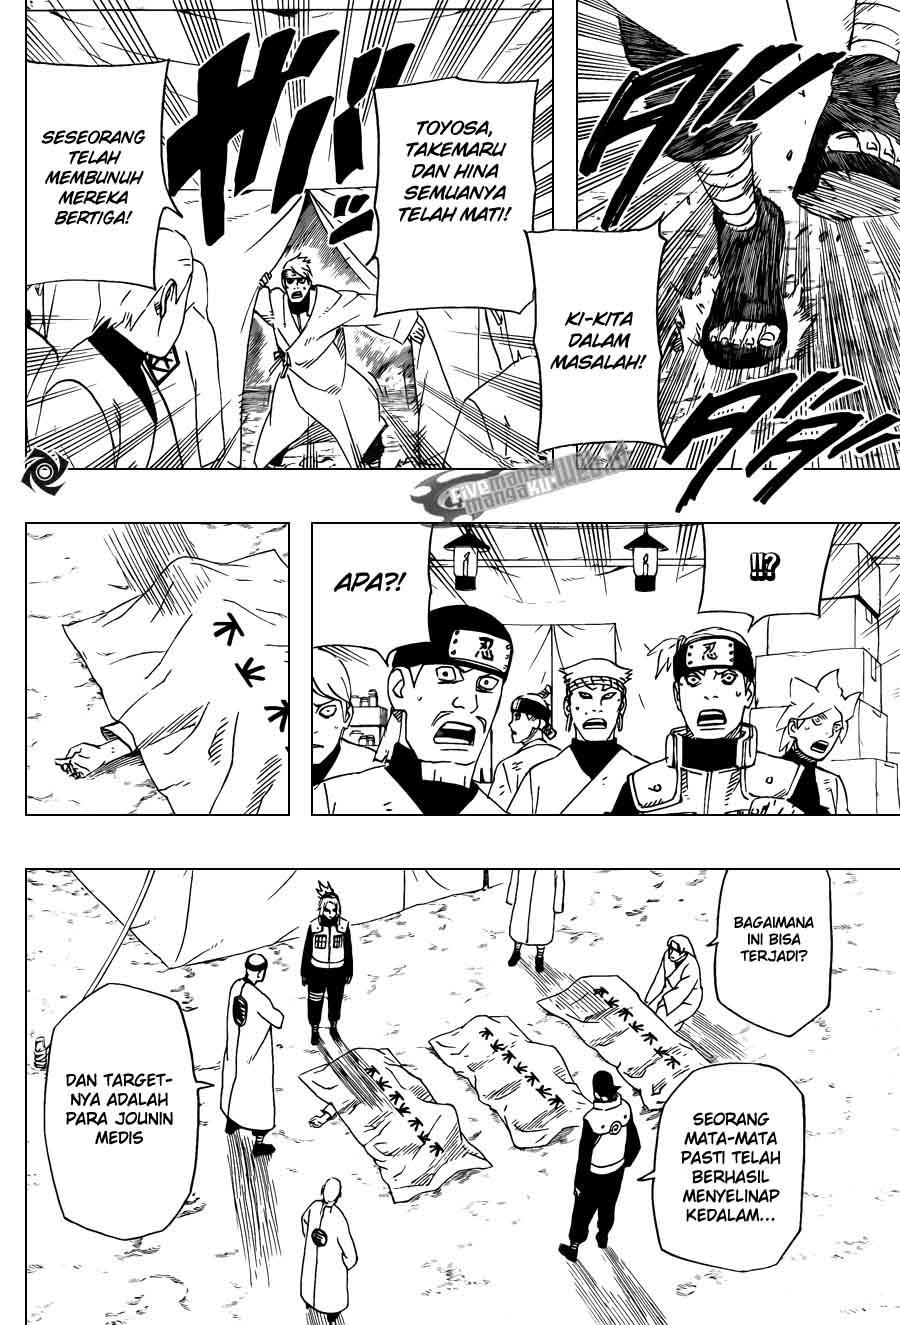 Baca Komik Naruto Shippuden 539-540 New Bahasa Indonesia